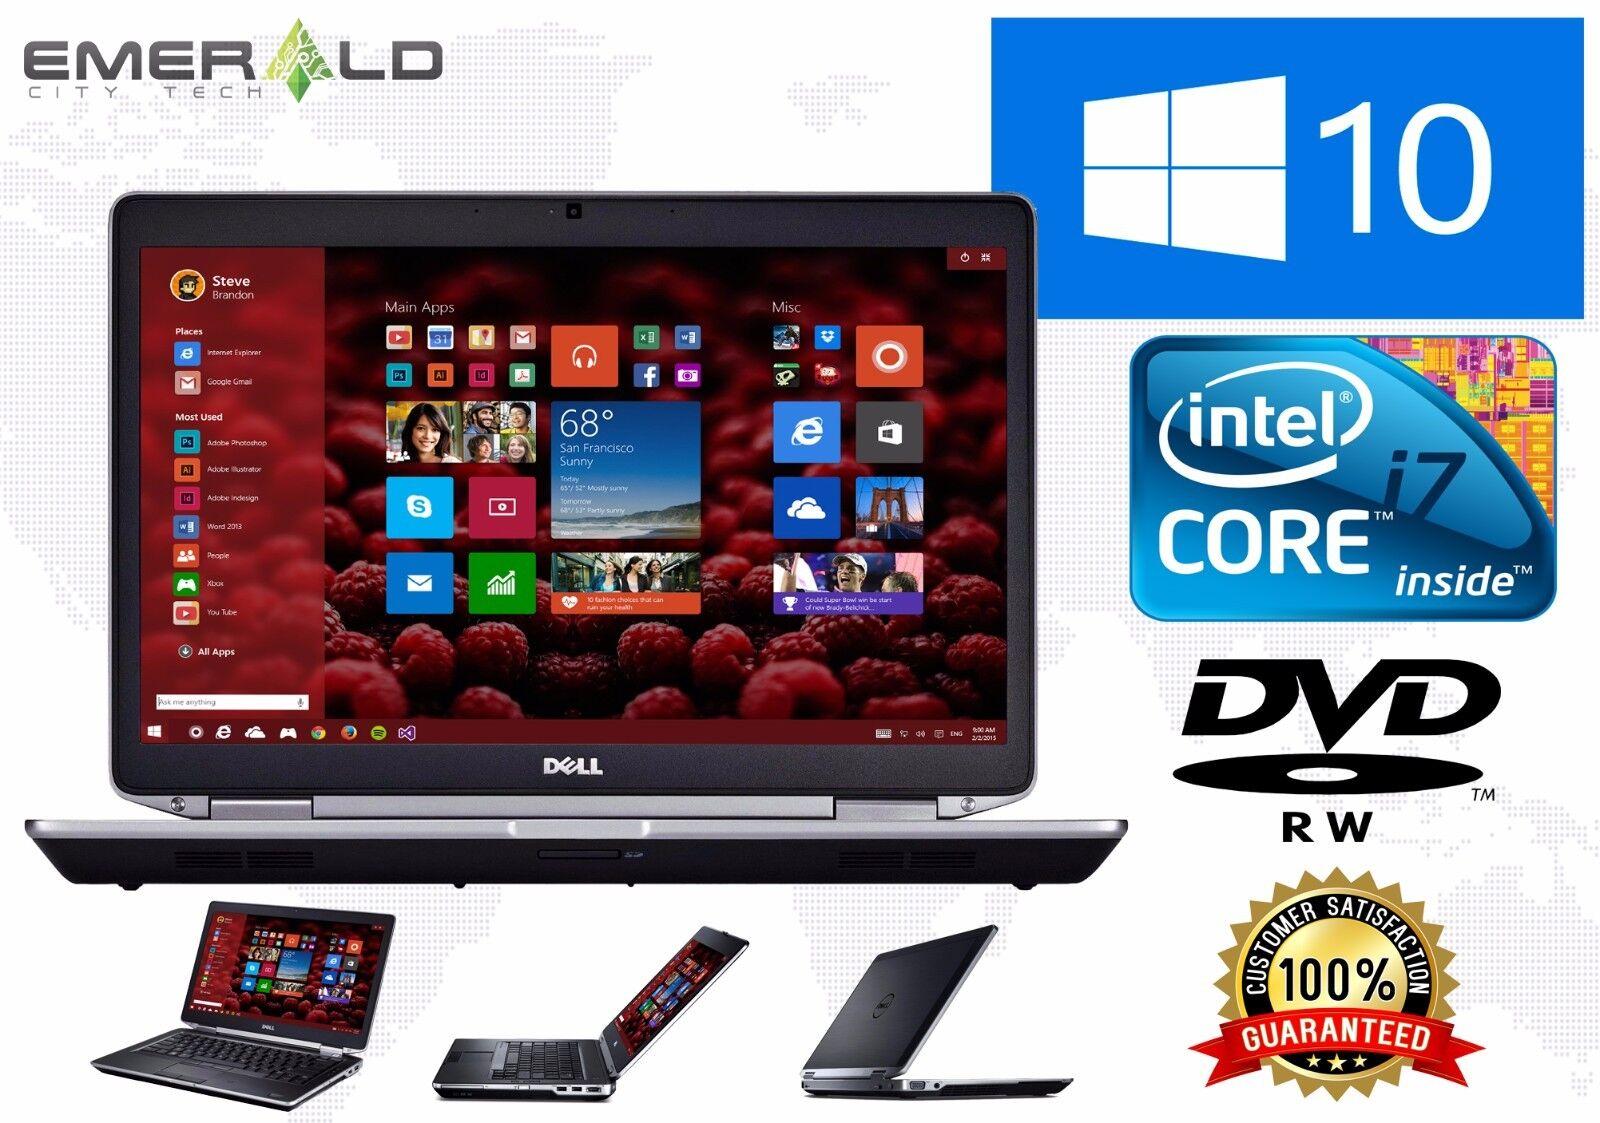 Dell Latitude Laptop E6430 Core i7 2.70Ghz Turbo 3rd Gen 4GB 250GB Backlit Keys